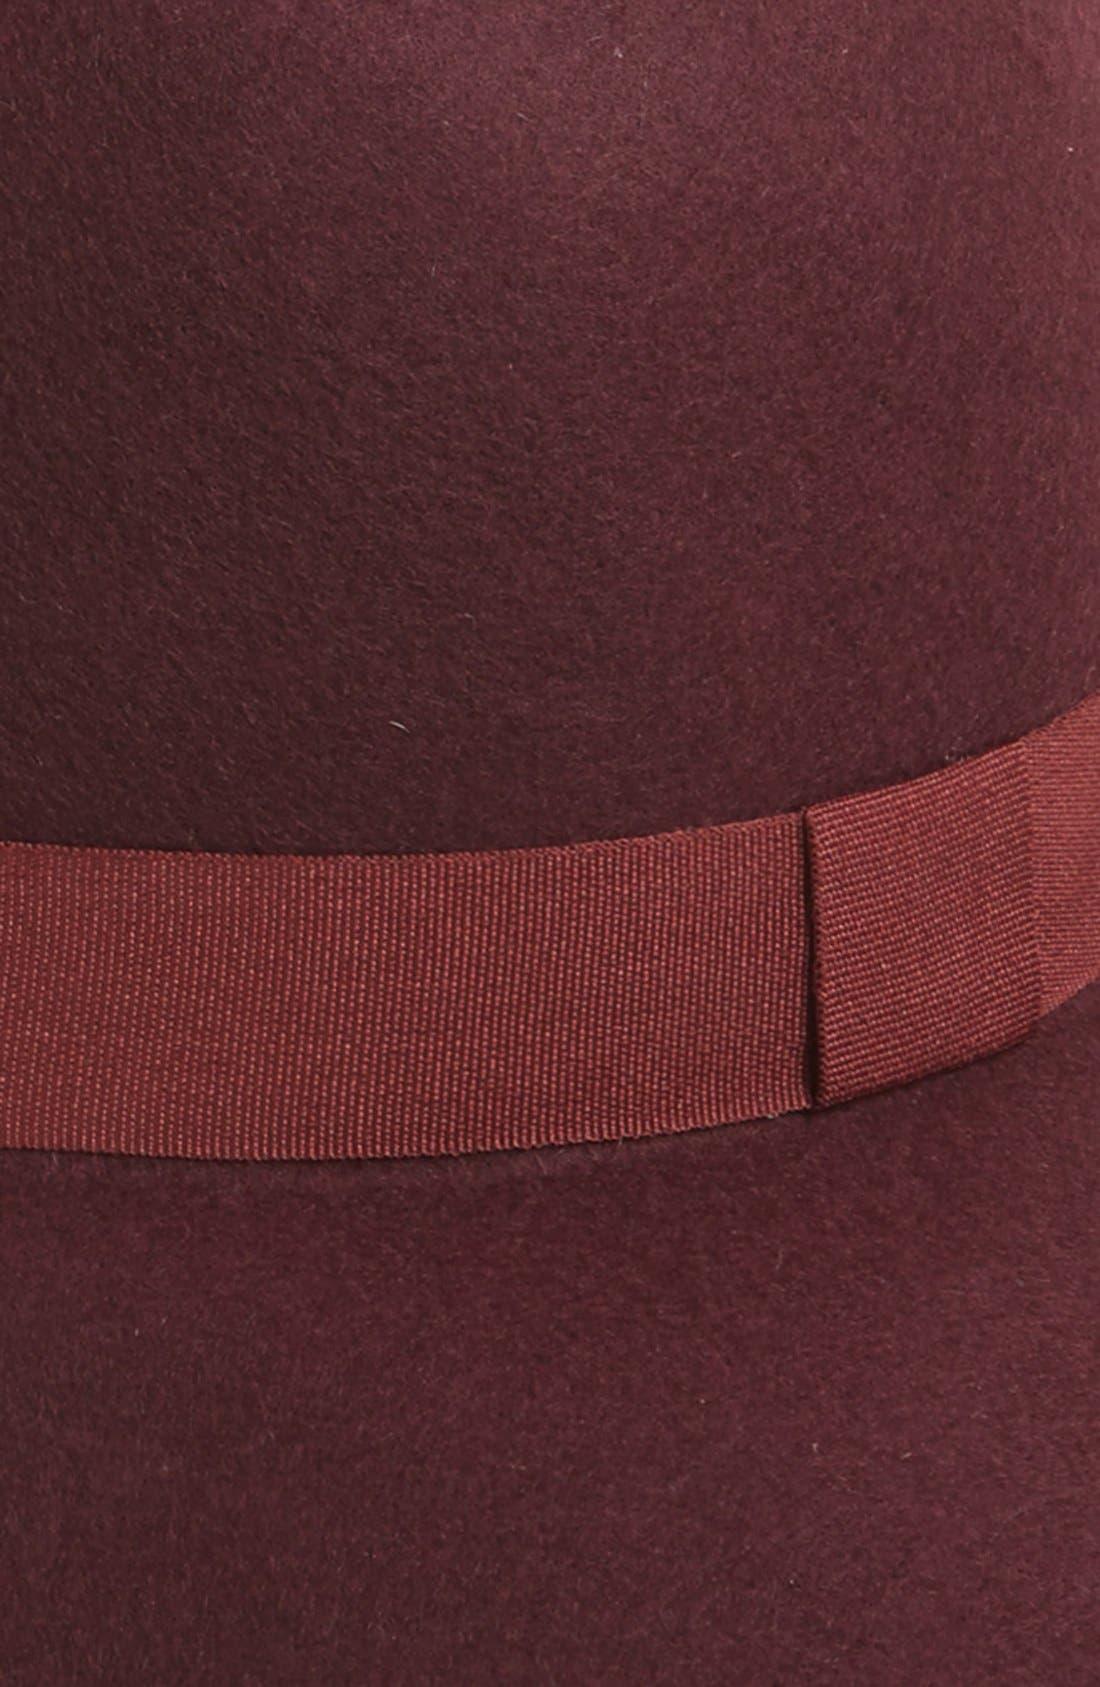 Ribbon Trim Felt Floppy Hat,                             Alternate thumbnail 2, color,                             Burgundy